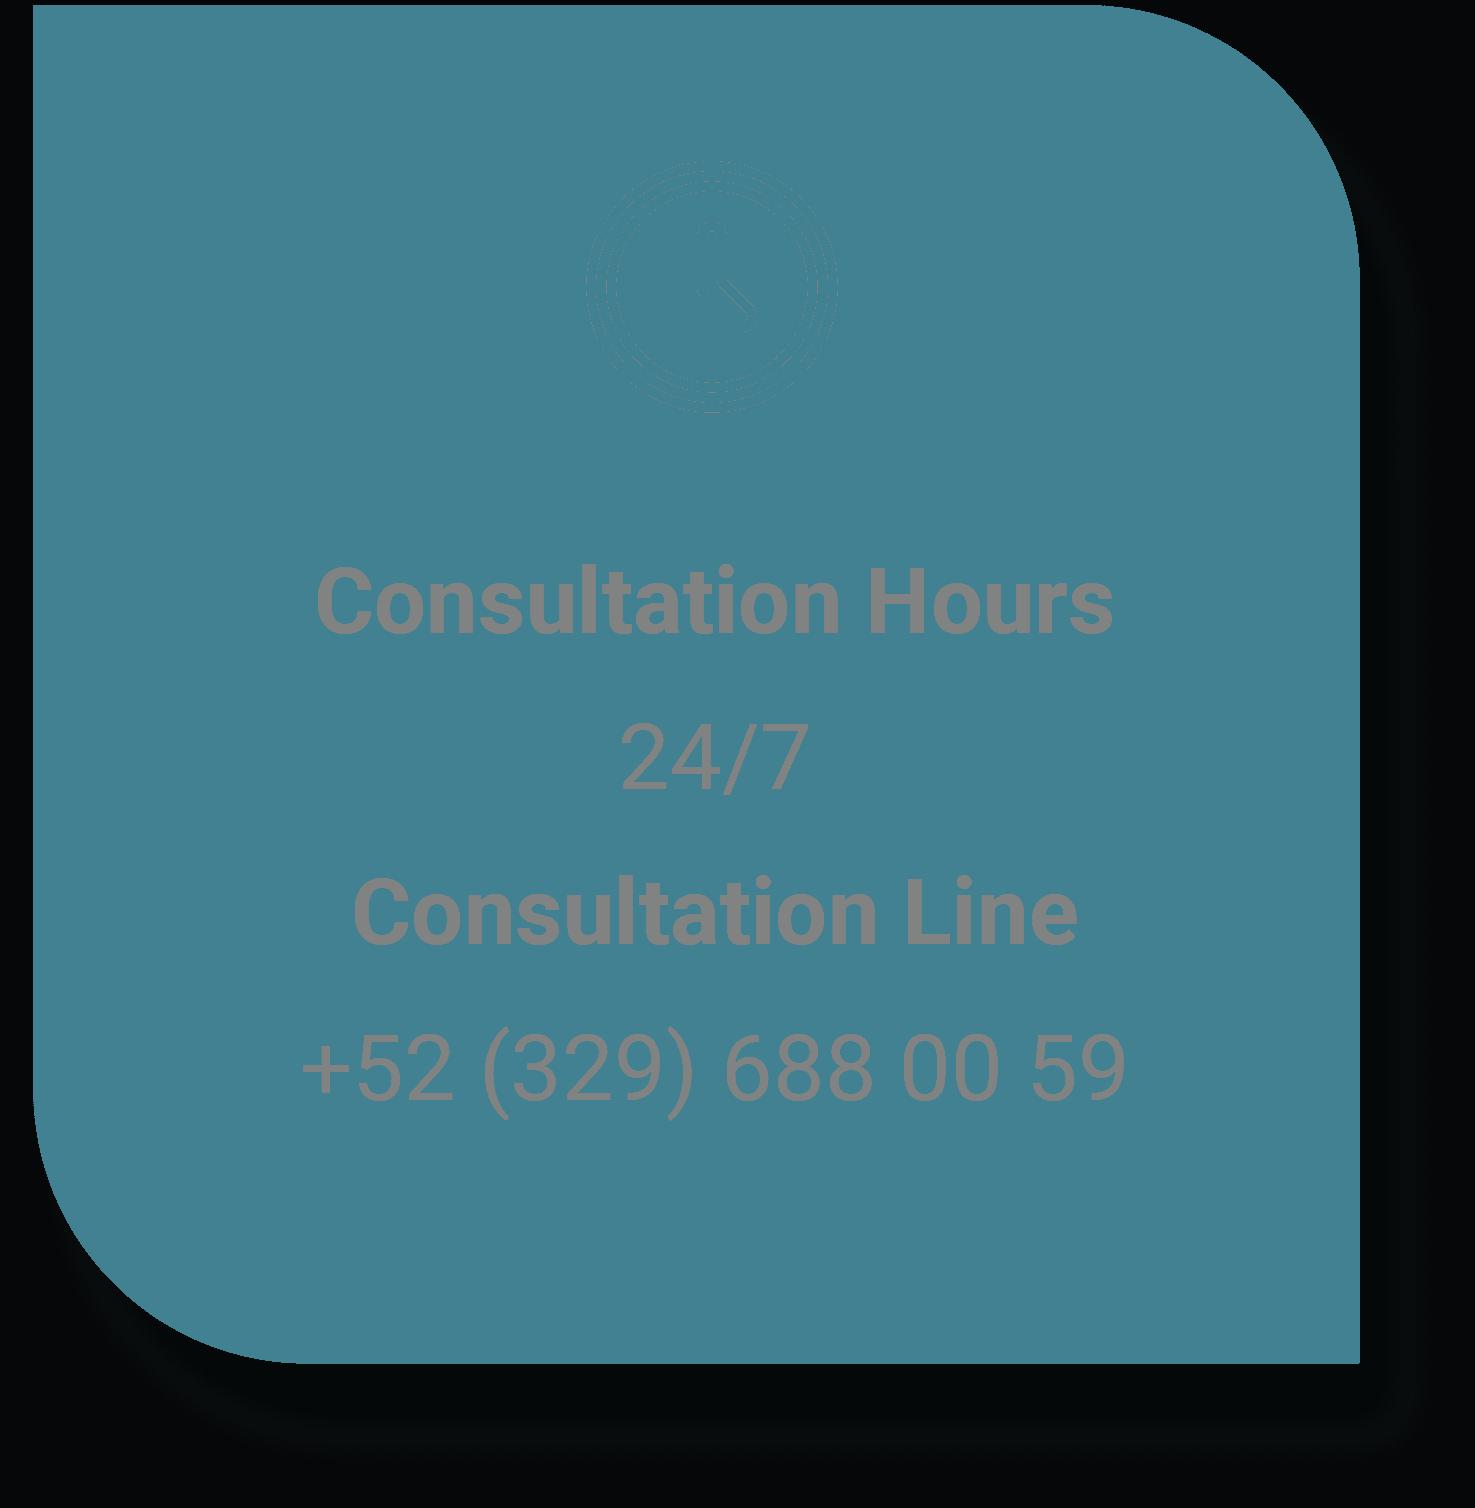 Consultation Hours